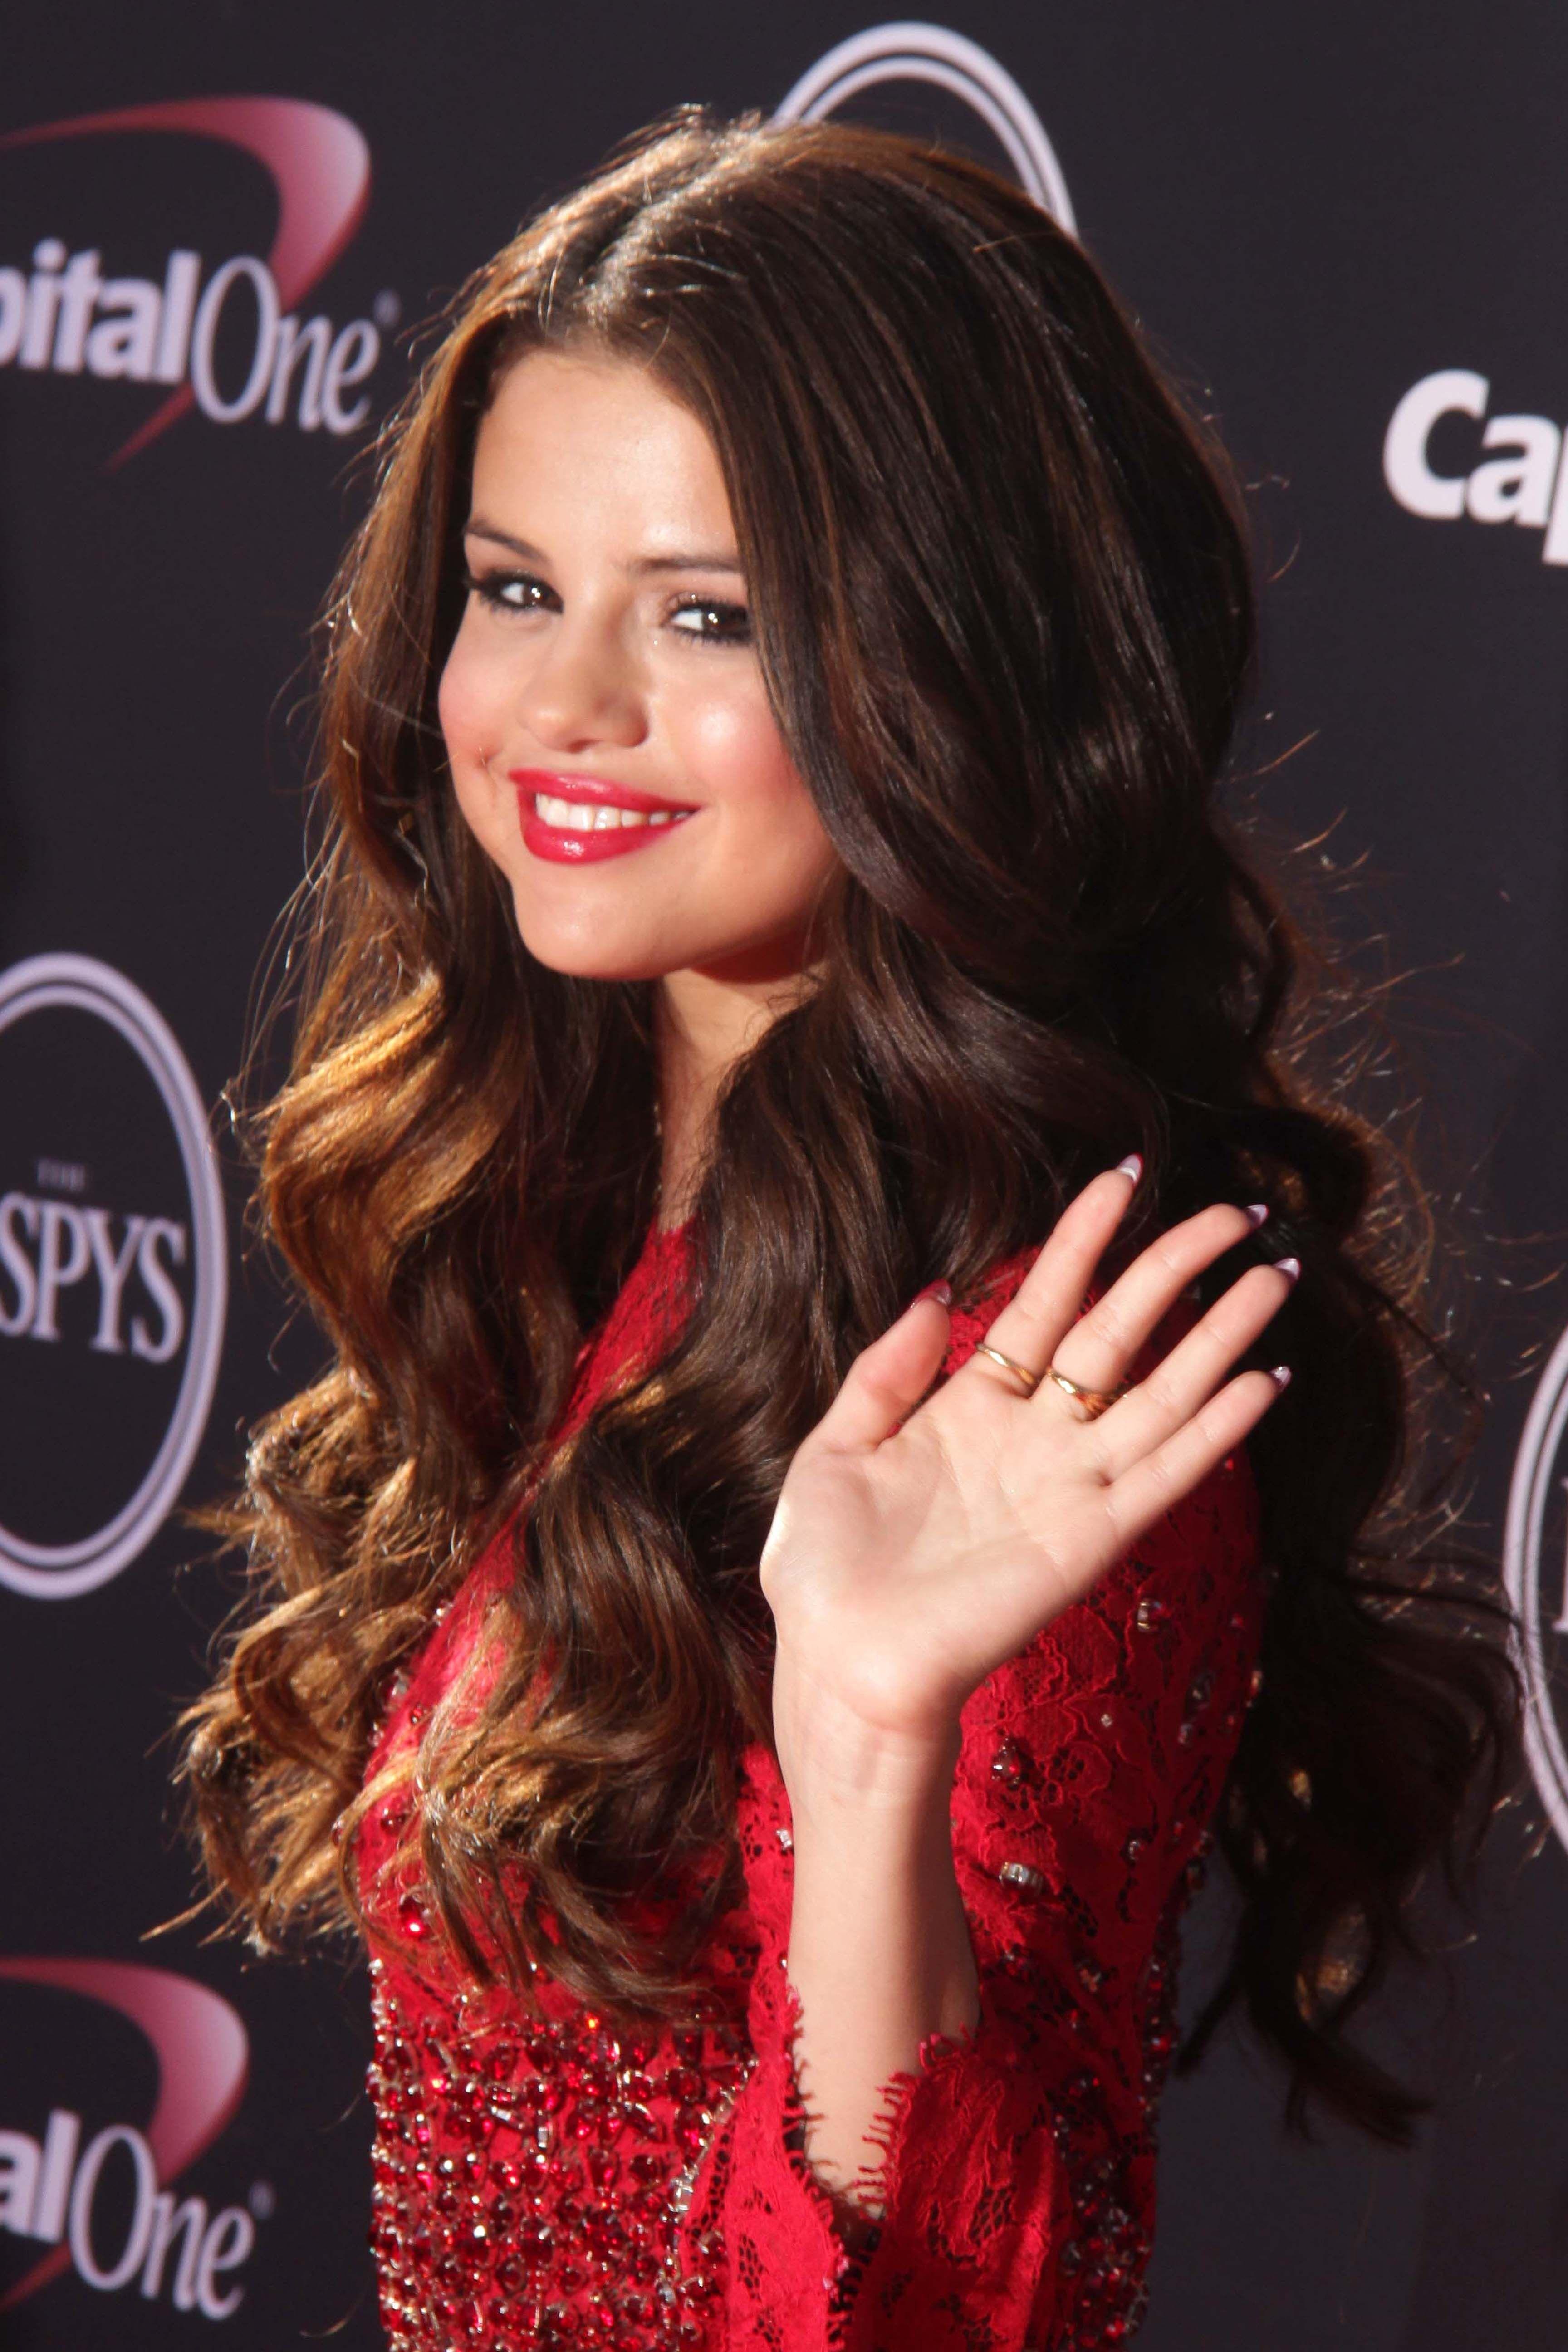 10. Selena Gomez